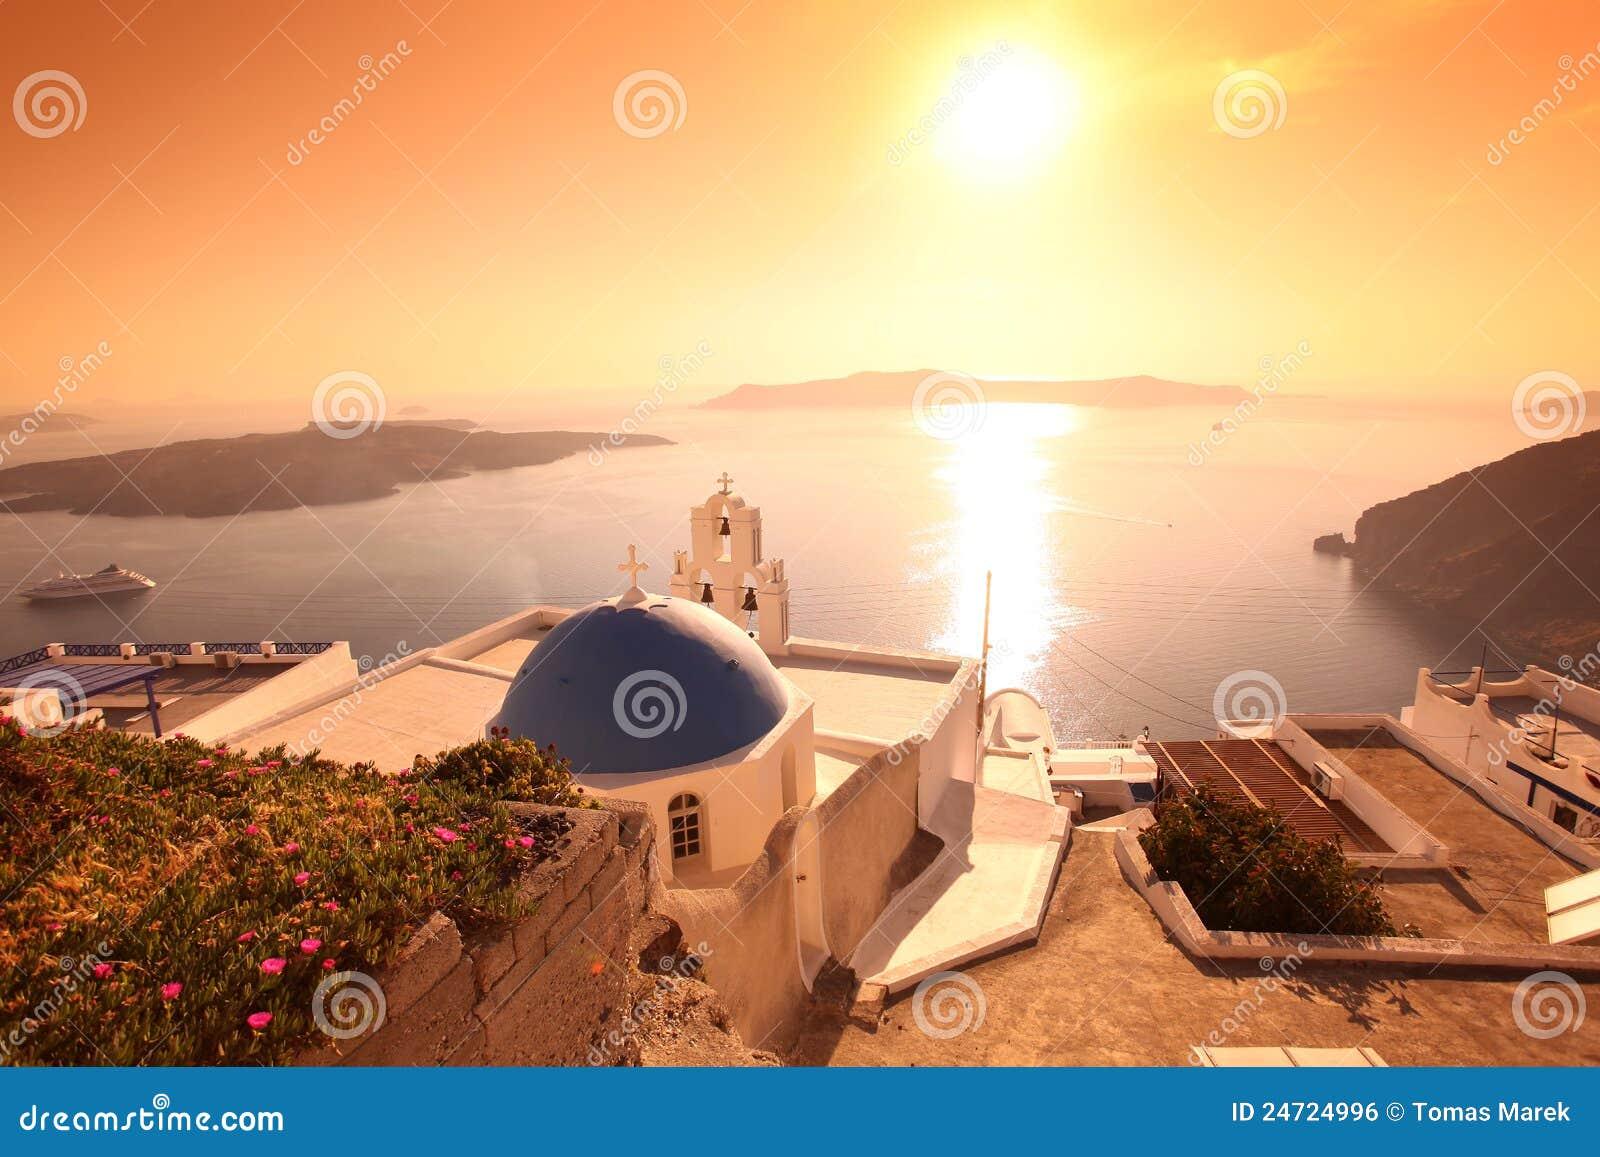 Santorini Church in Fira against sunset,Greece